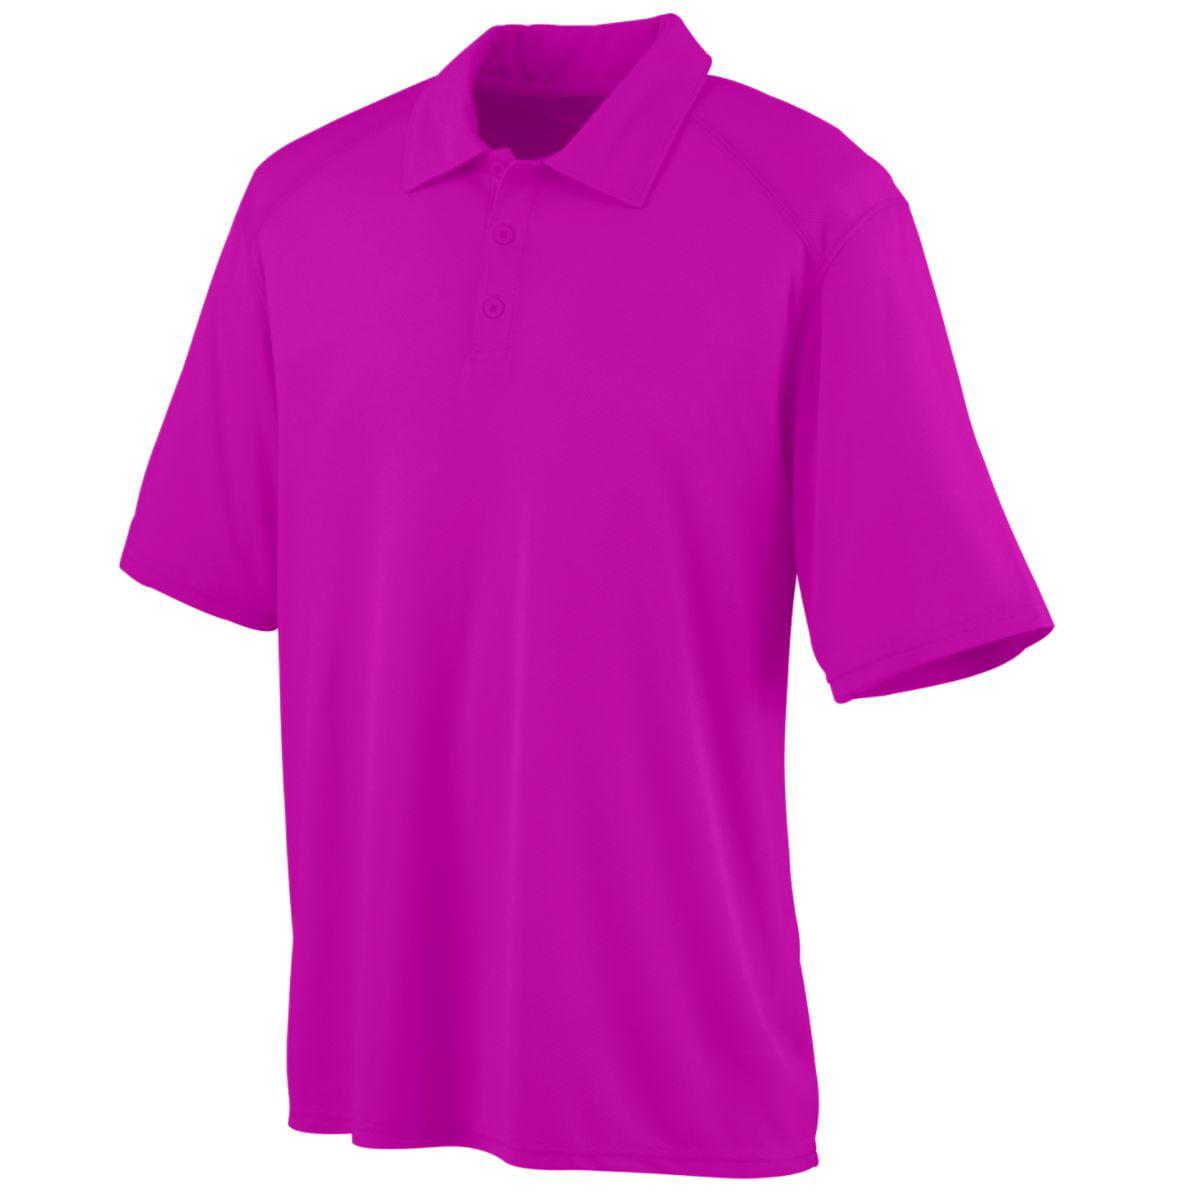 Augusta Vision Sport Shirt Powpk 2Xl - image 1 of 1